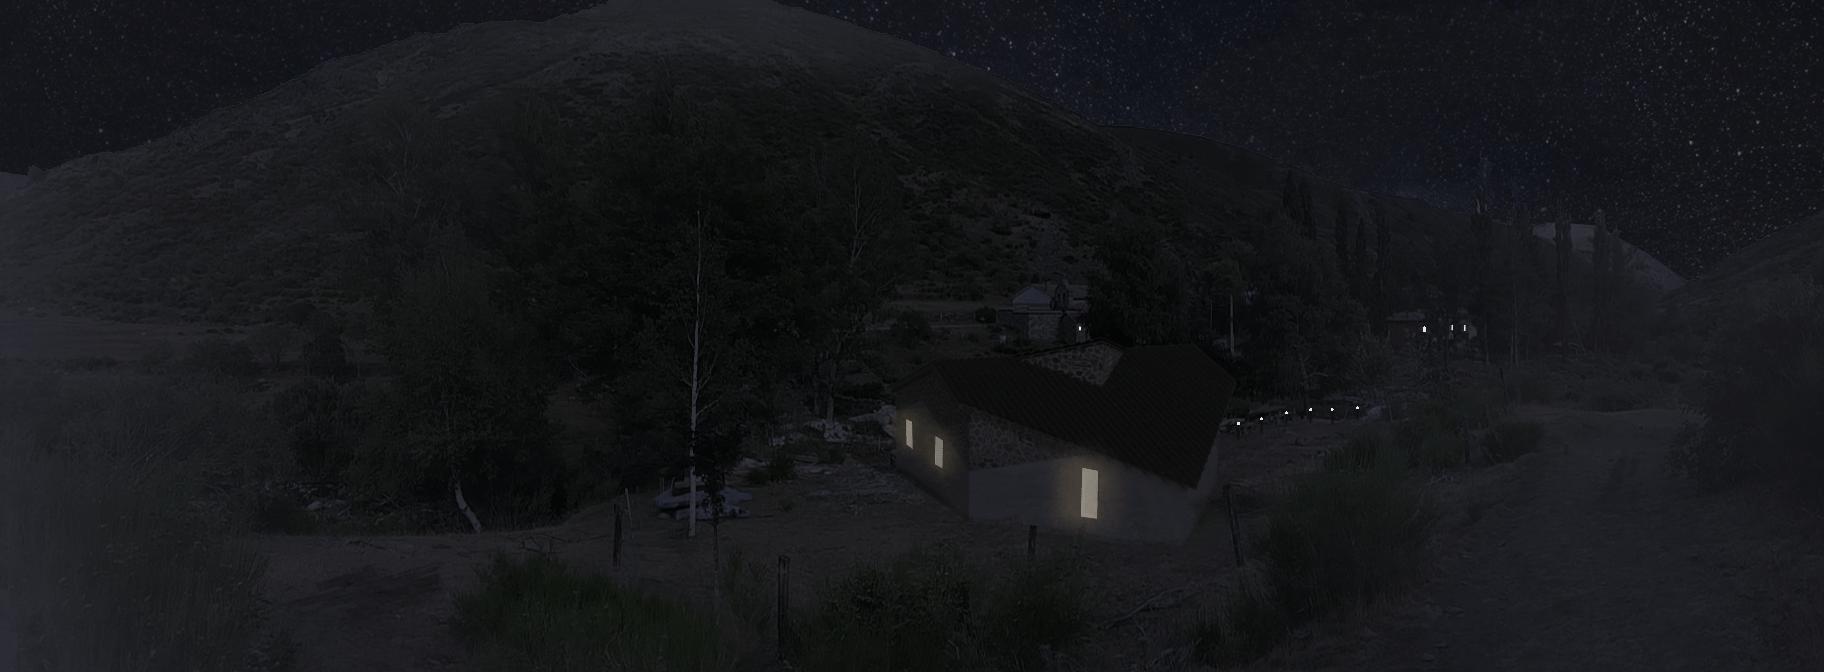 sietequince proyecto refugio espigüete montaña exterior nocturna